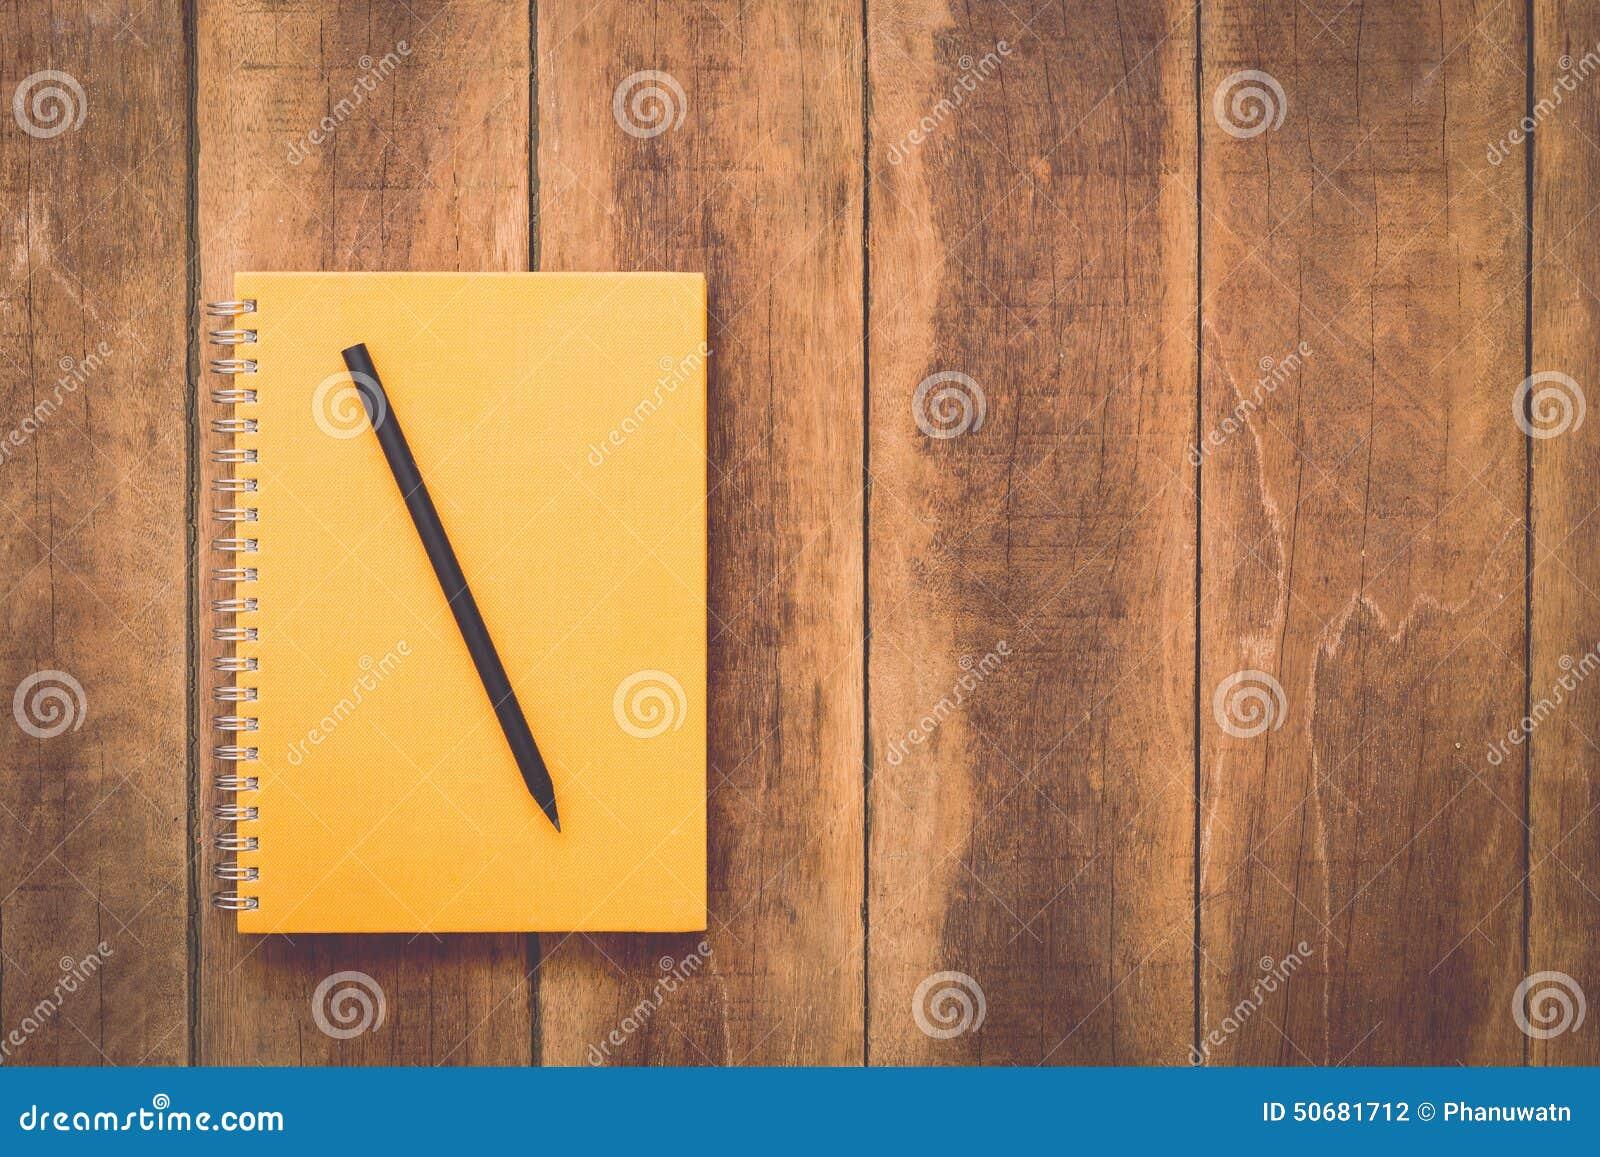 Download 笔记本和铅笔在木头 库存照片. 图片 包括有 木头, 背包, 消息, 记事本, 开放, 纸张, 文件, 空间 - 50681712